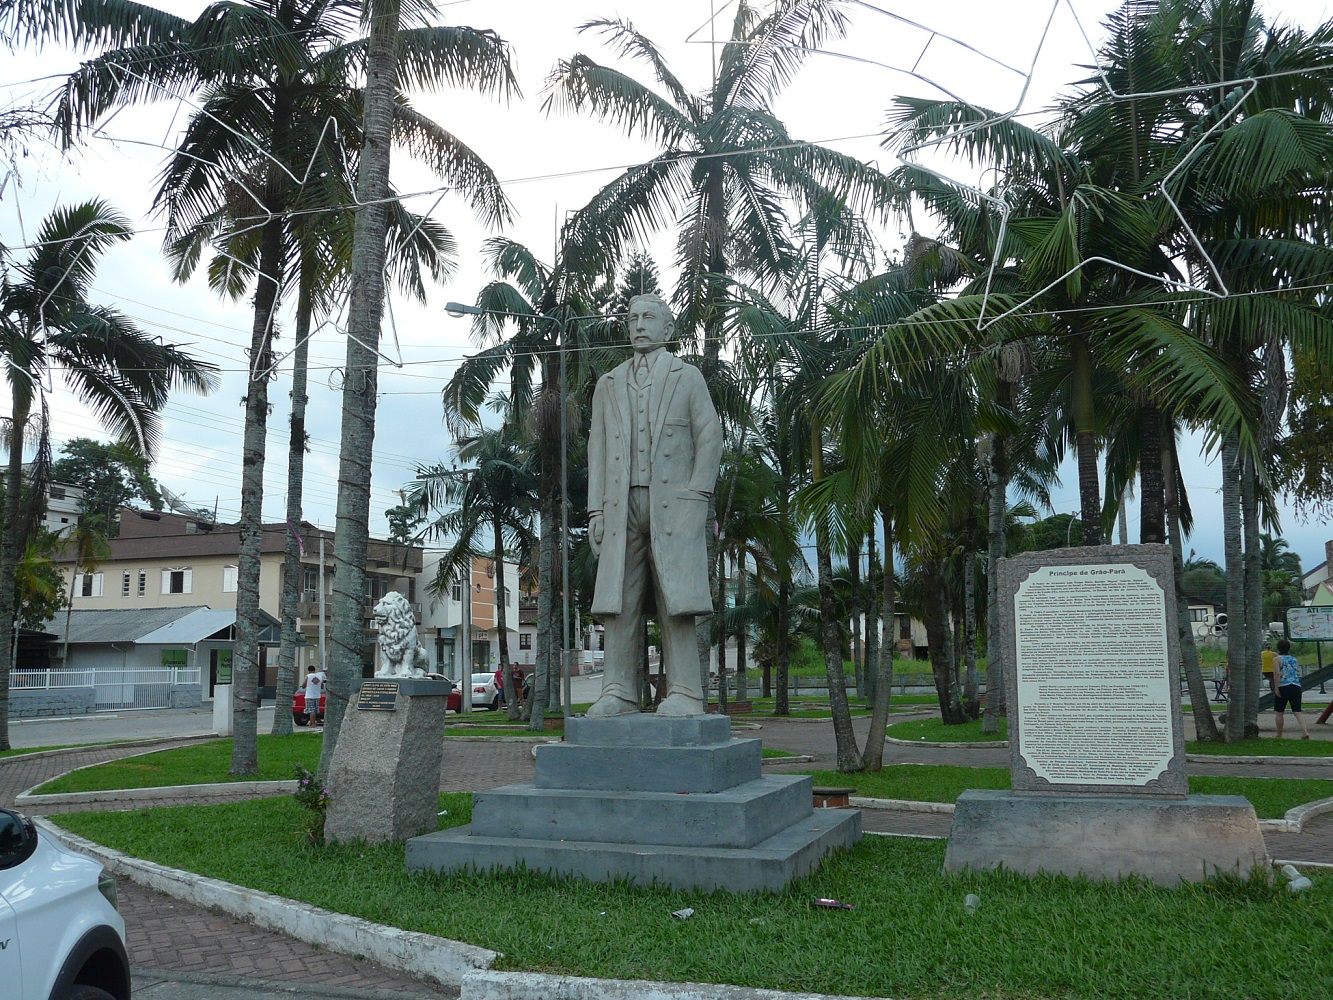 Urubici Grão Pará